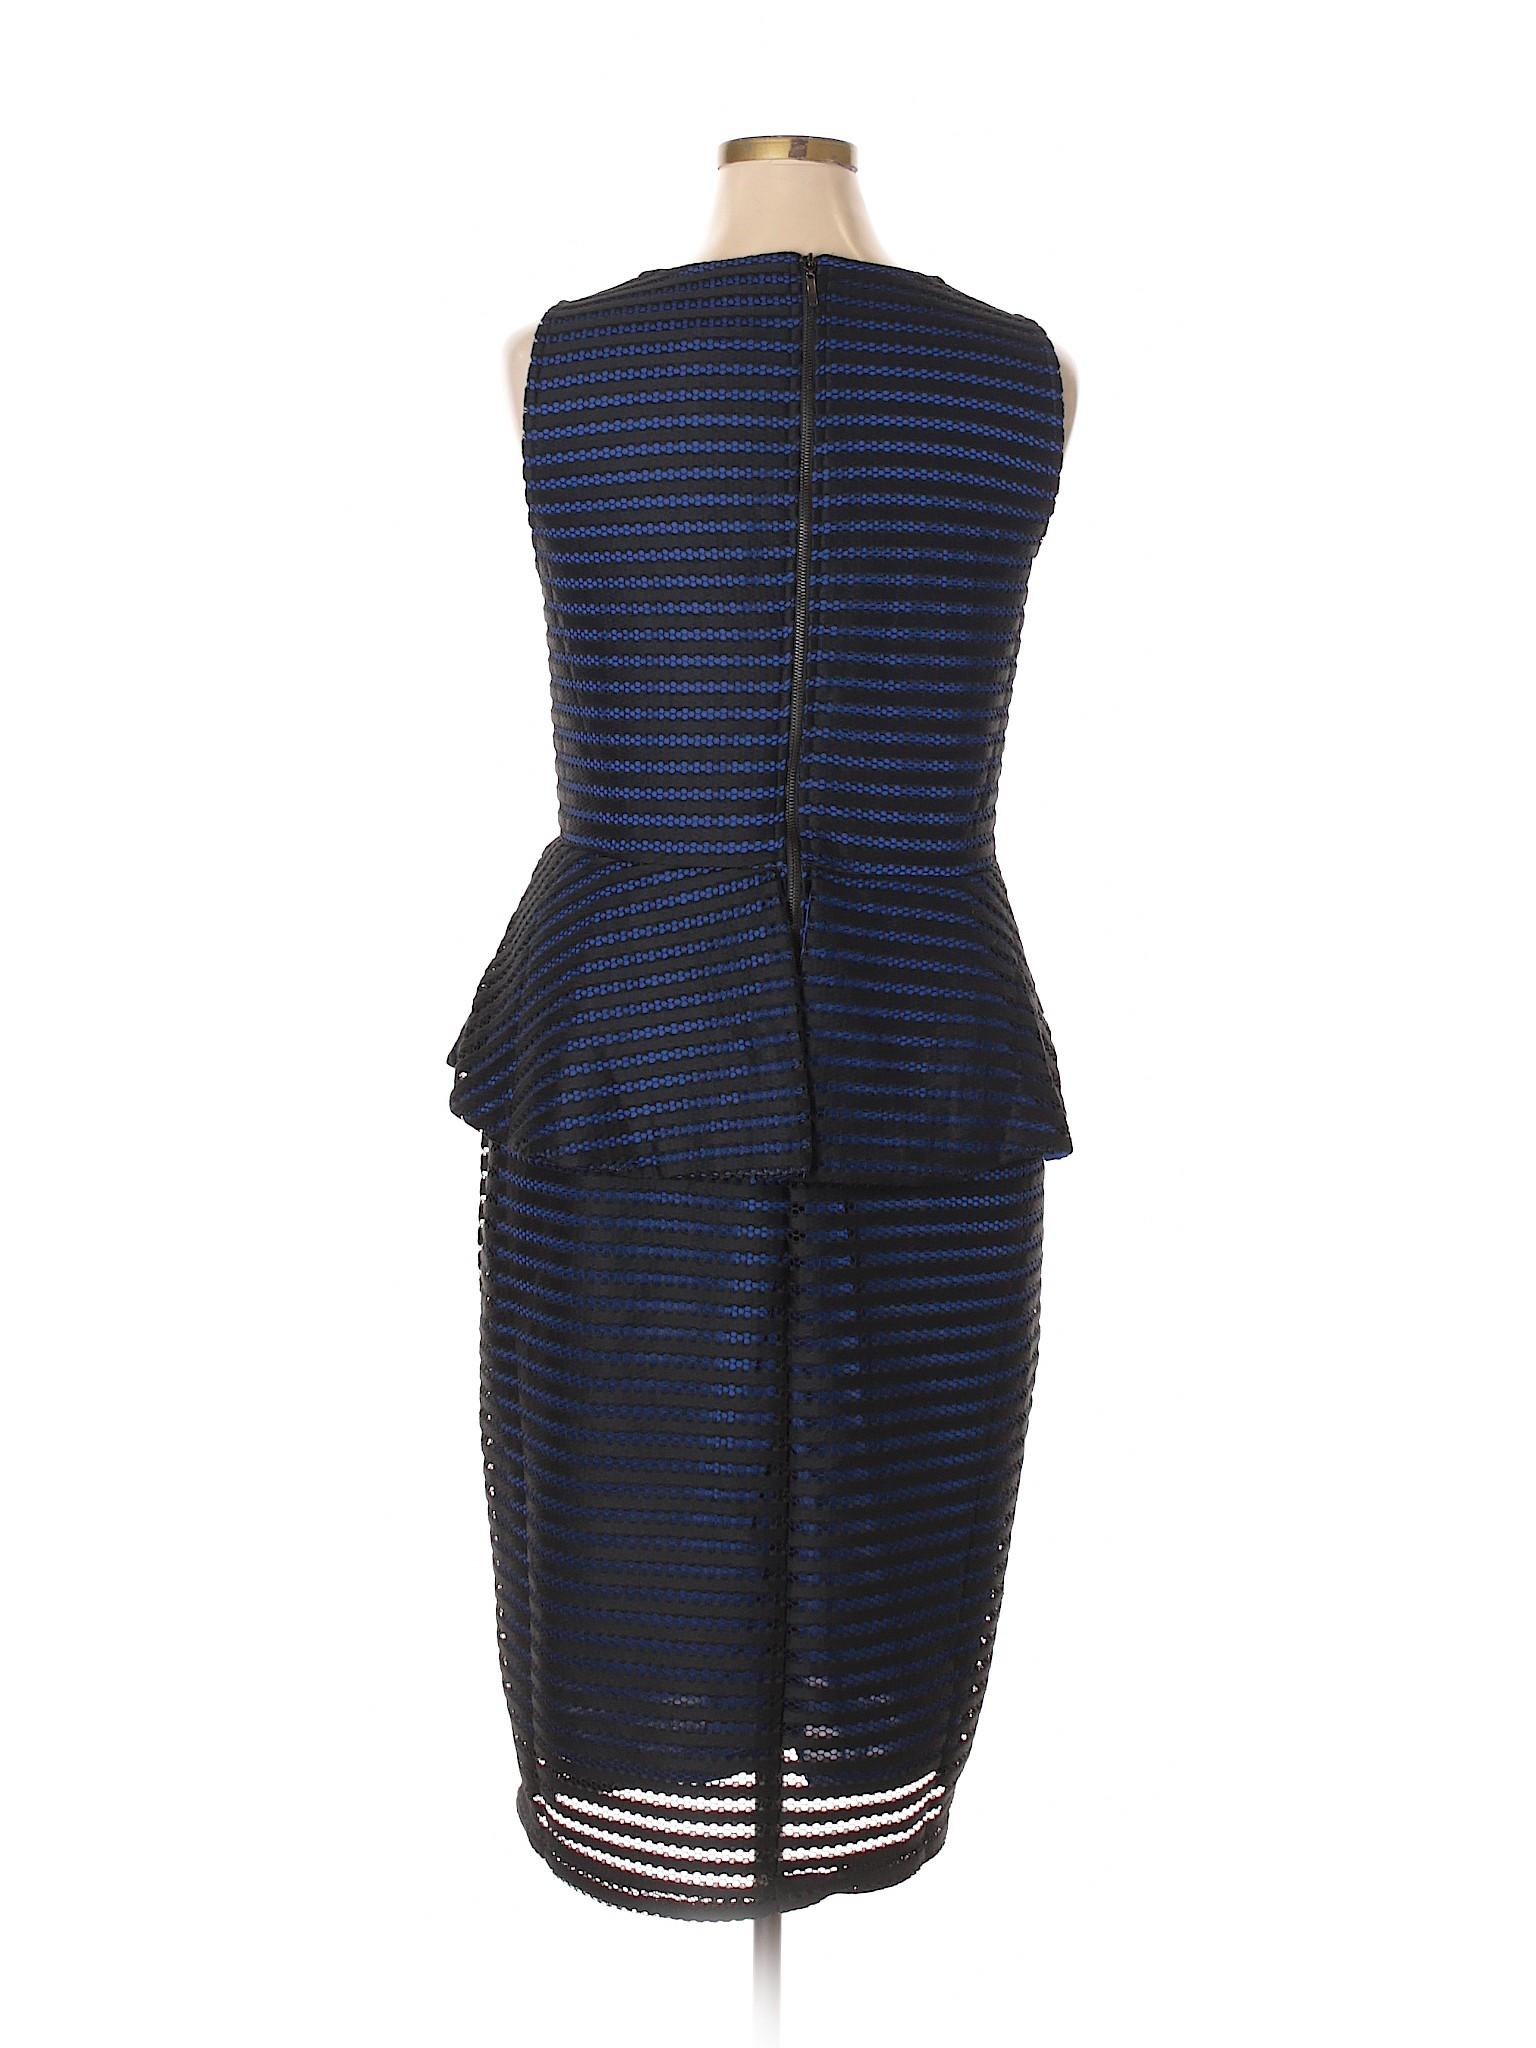 Dress winter Casual City Chic Boutique ZqTIRw4HZW